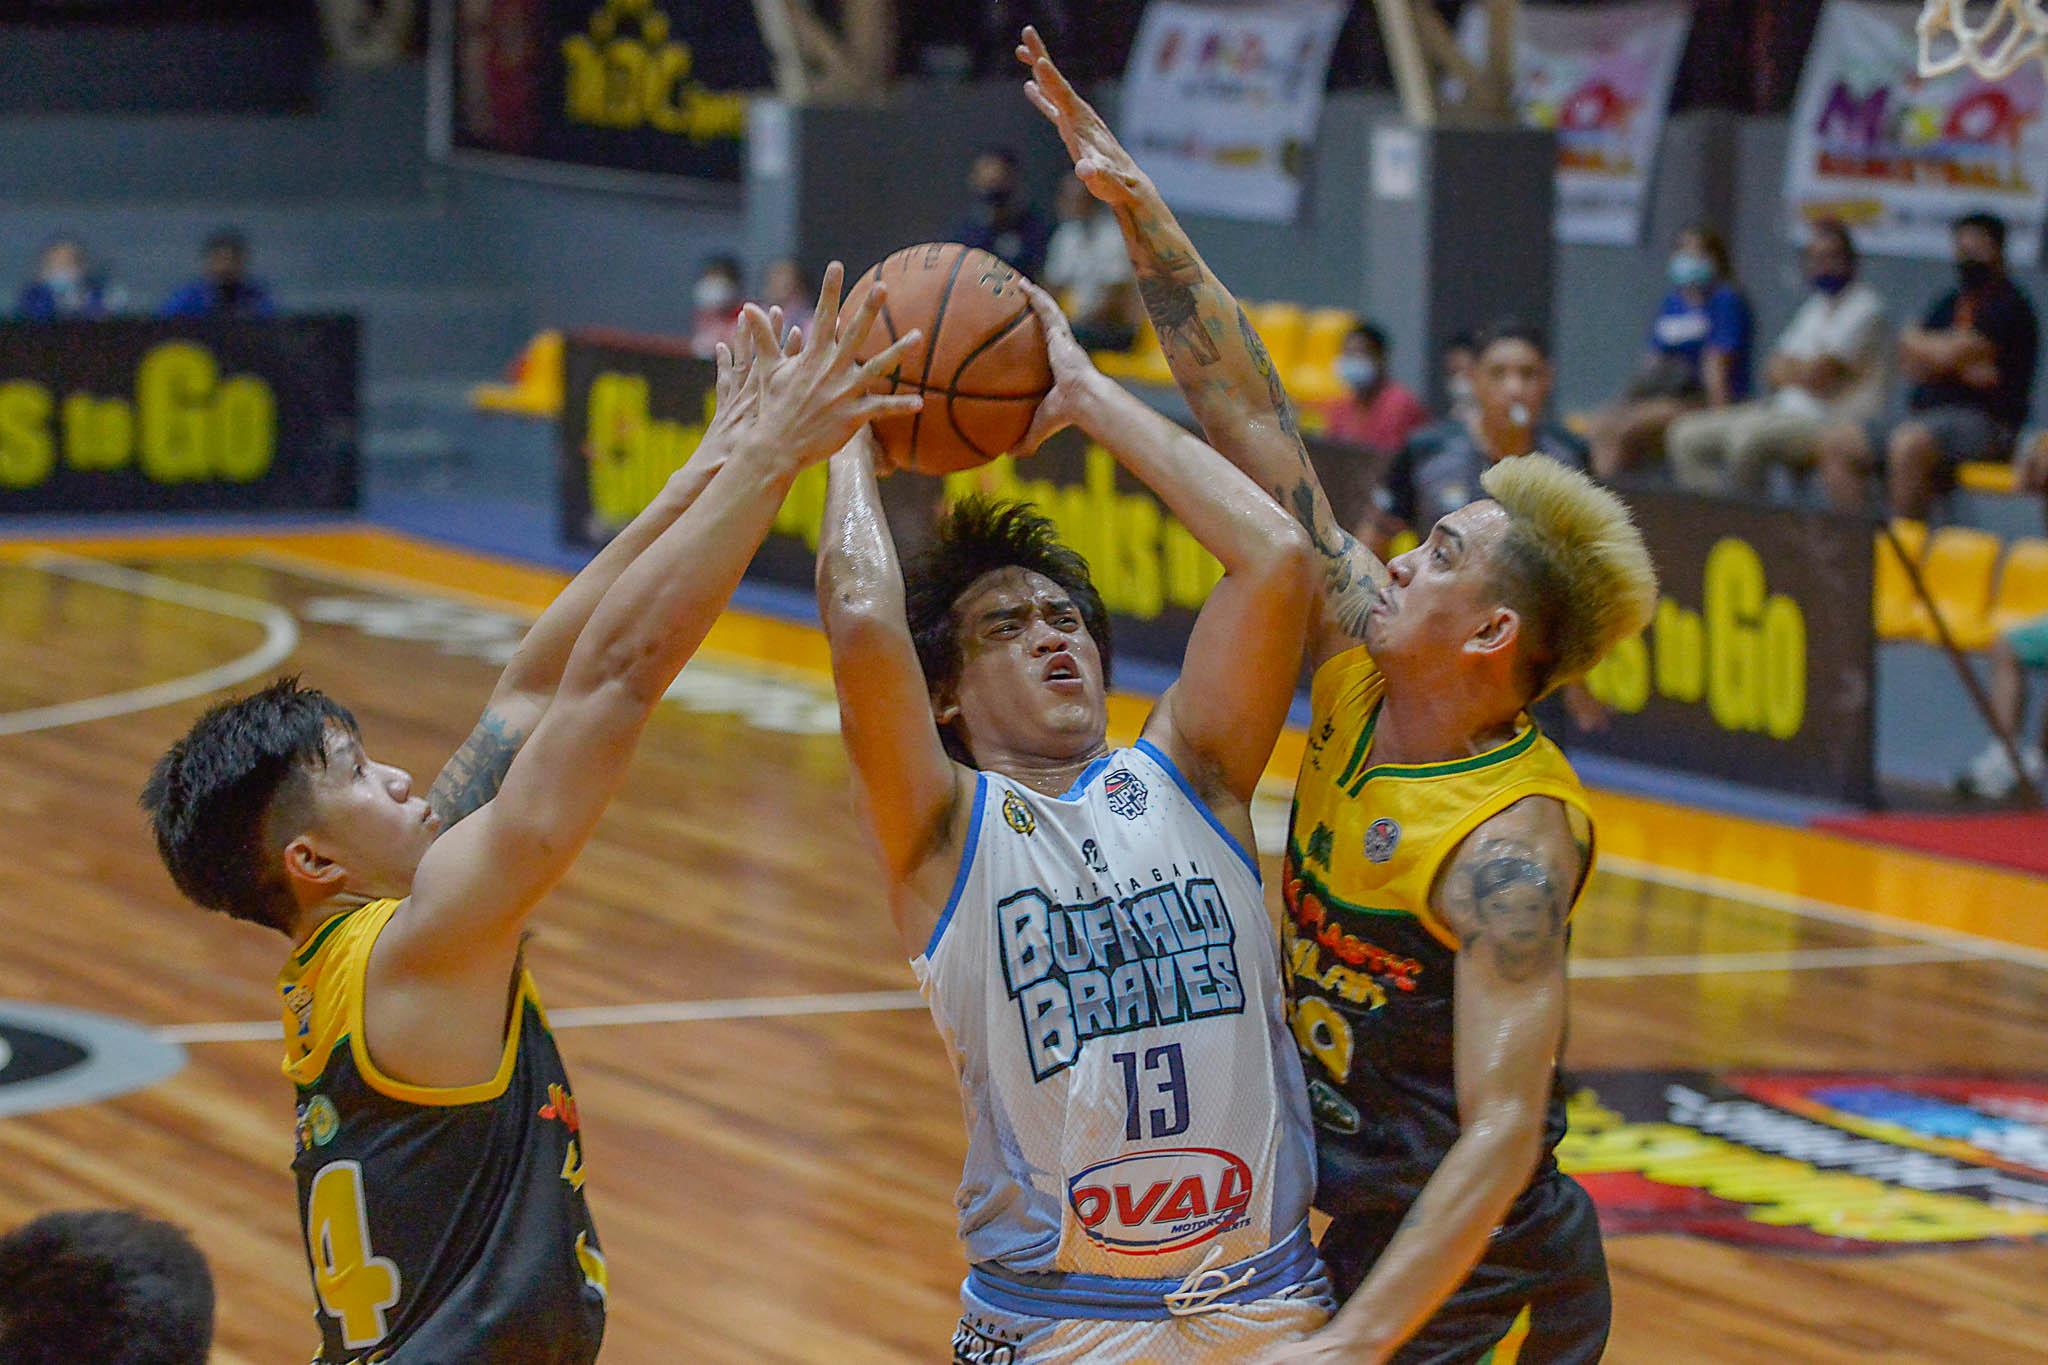 2021-Chooks-to-Go-VisMin-Kapatagan-vs-Basilan-Shaq-Alanes Basilan's Cabiltes shares secret to breaking VisMin, D-League records Basketball News VisMin Super Cup  - philippine sports news